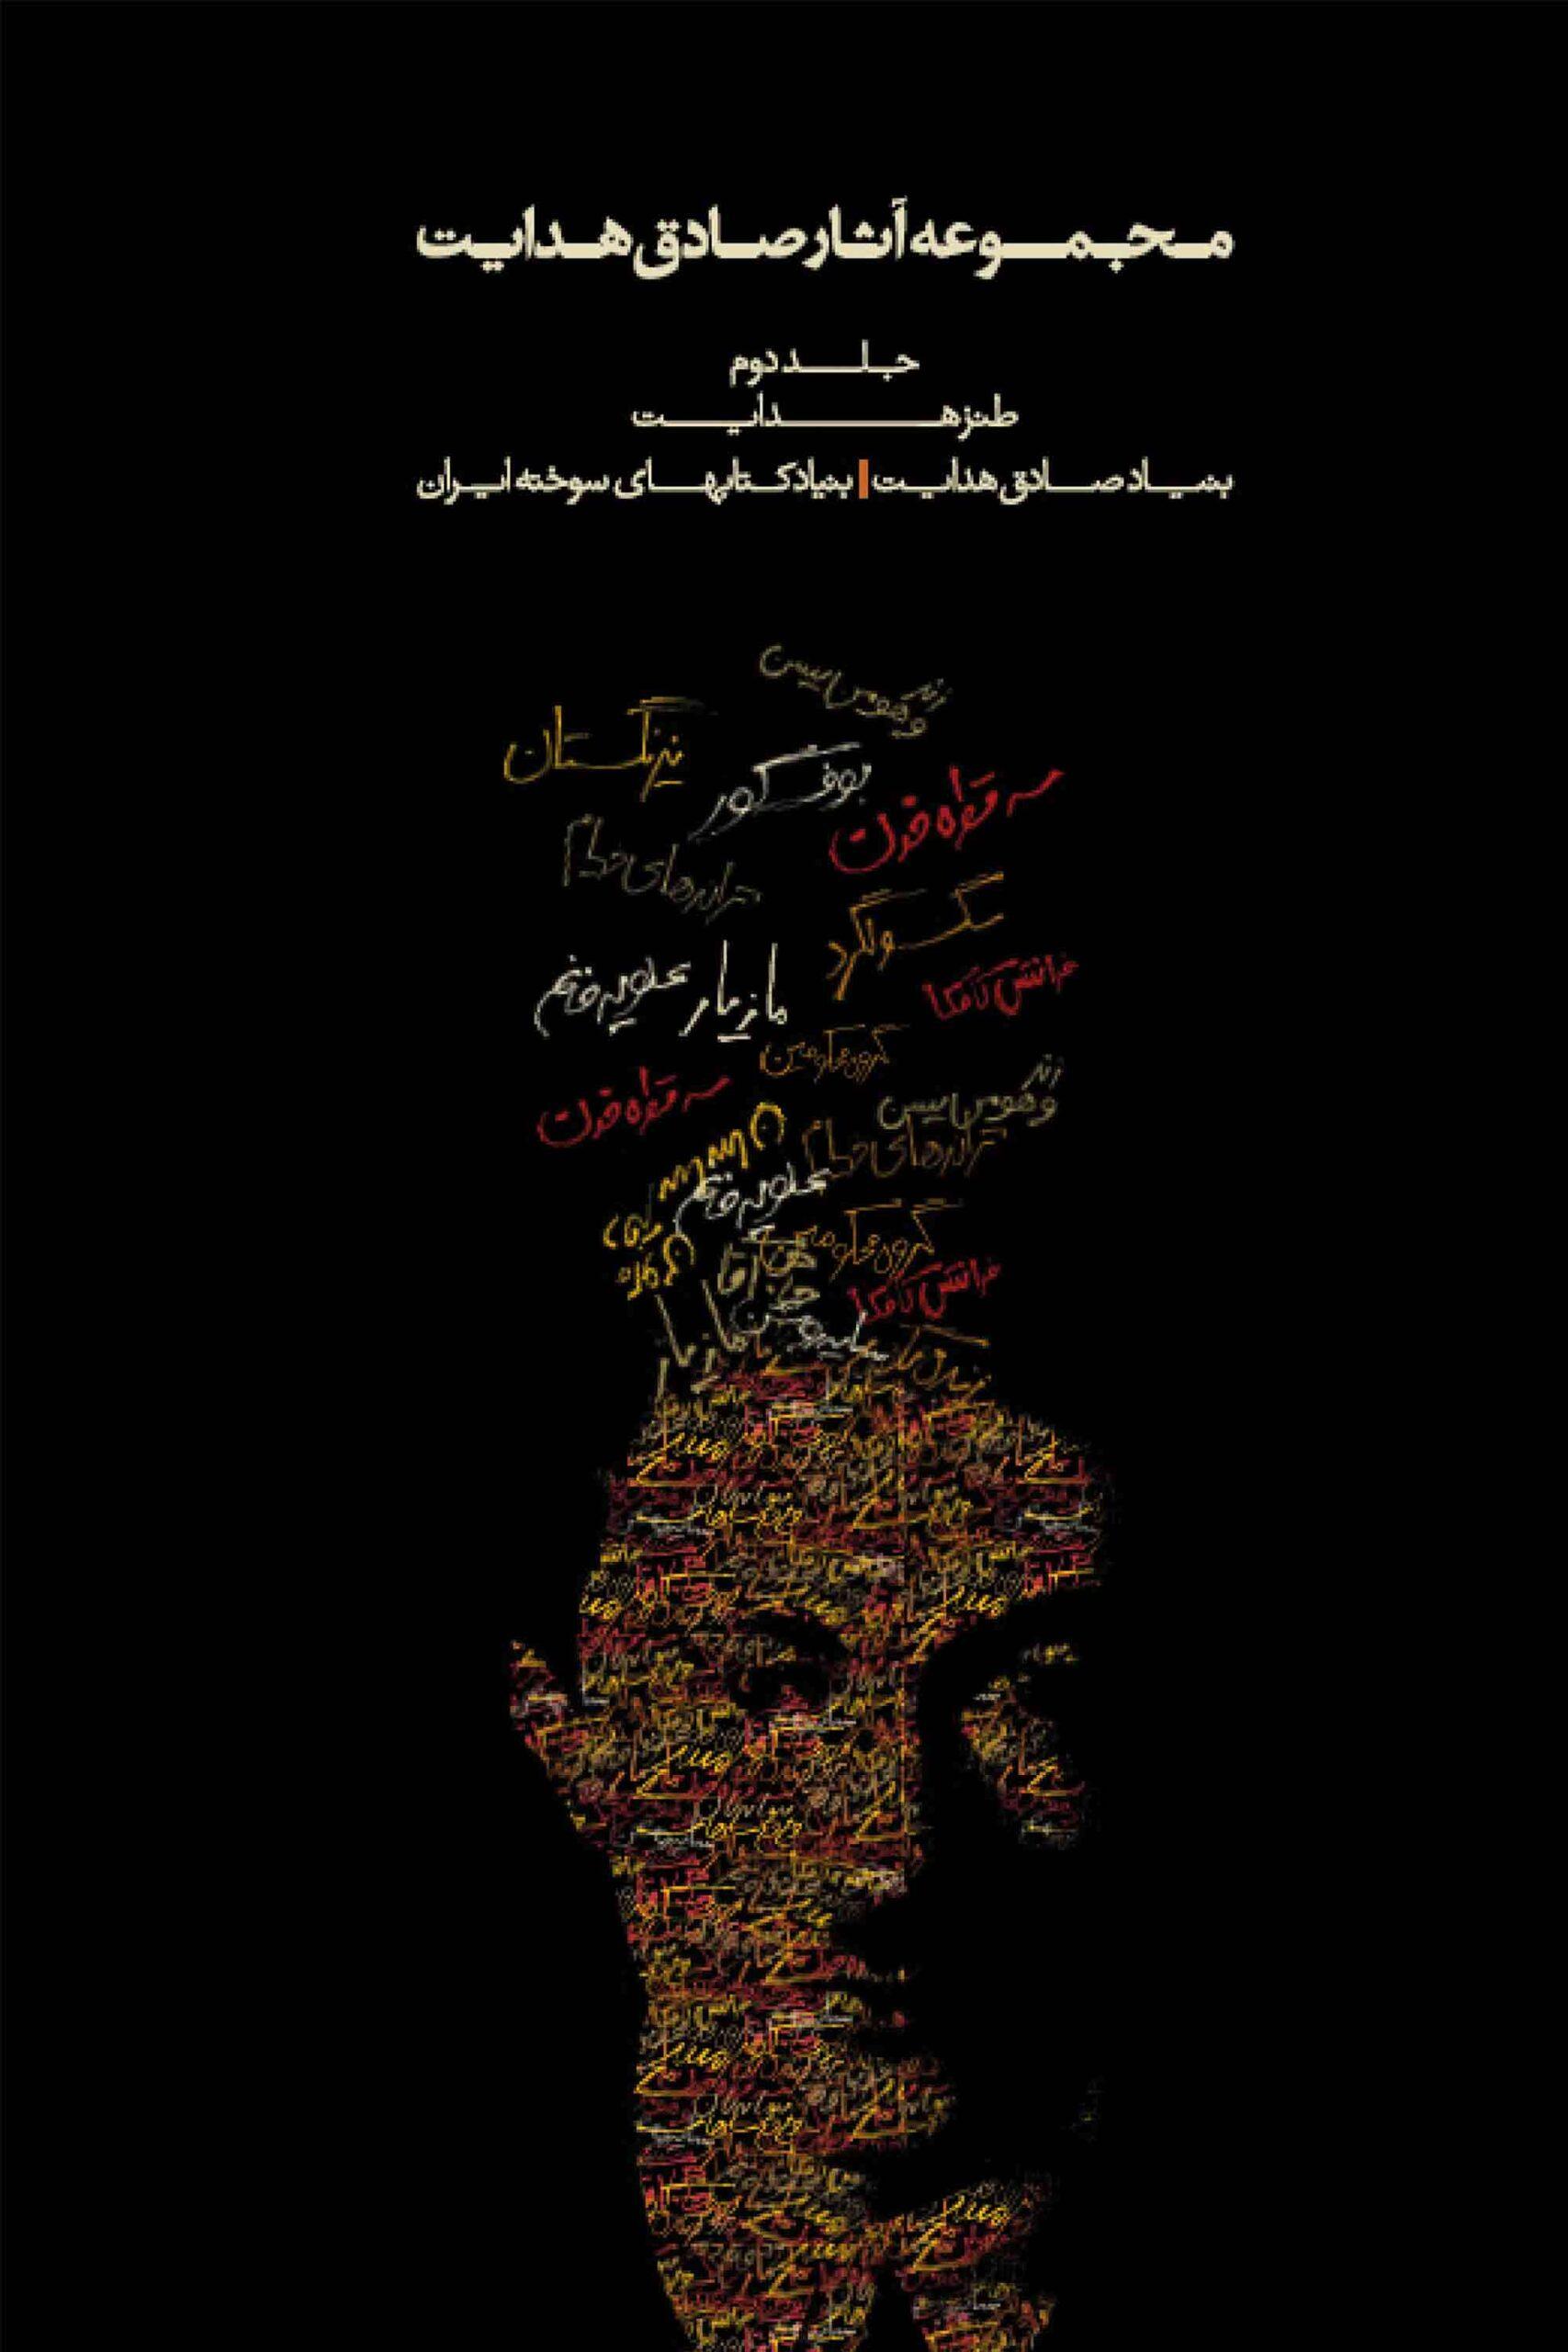 Sadegh Hedayat Vol. II – The Satirical Works